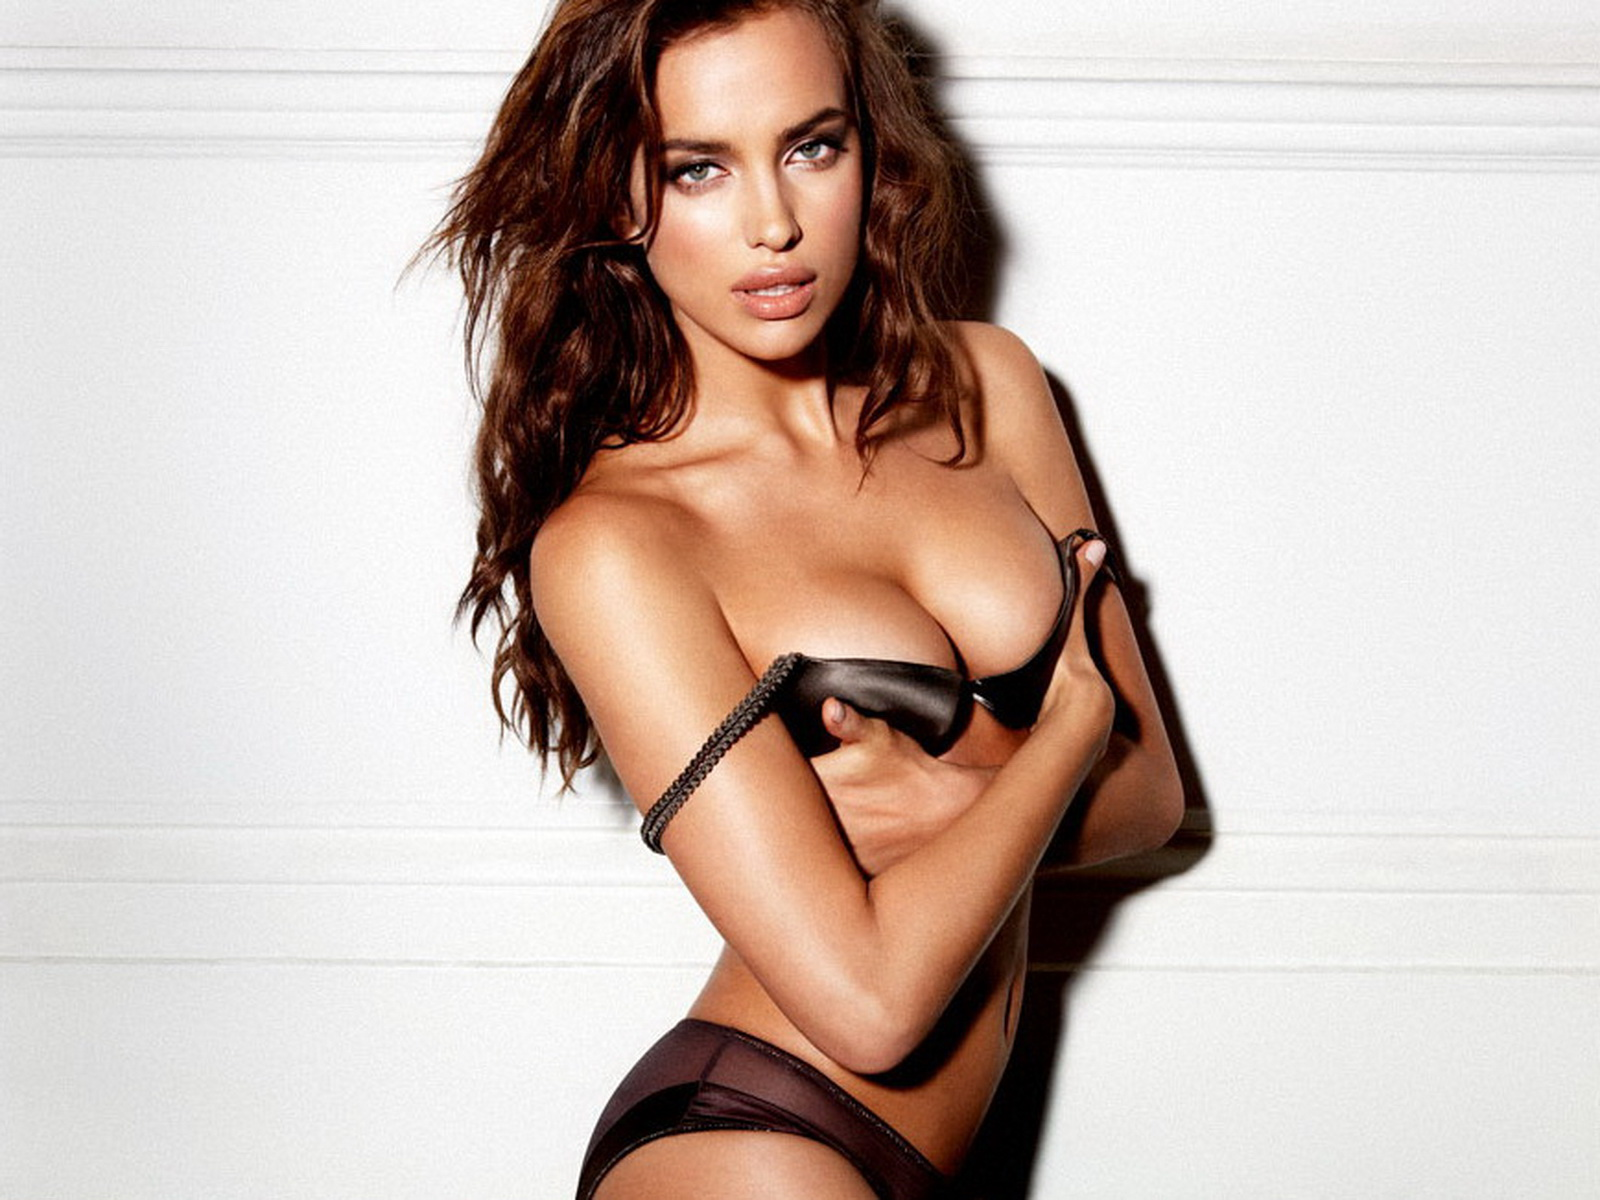 Irina Shayk Nude Pictures